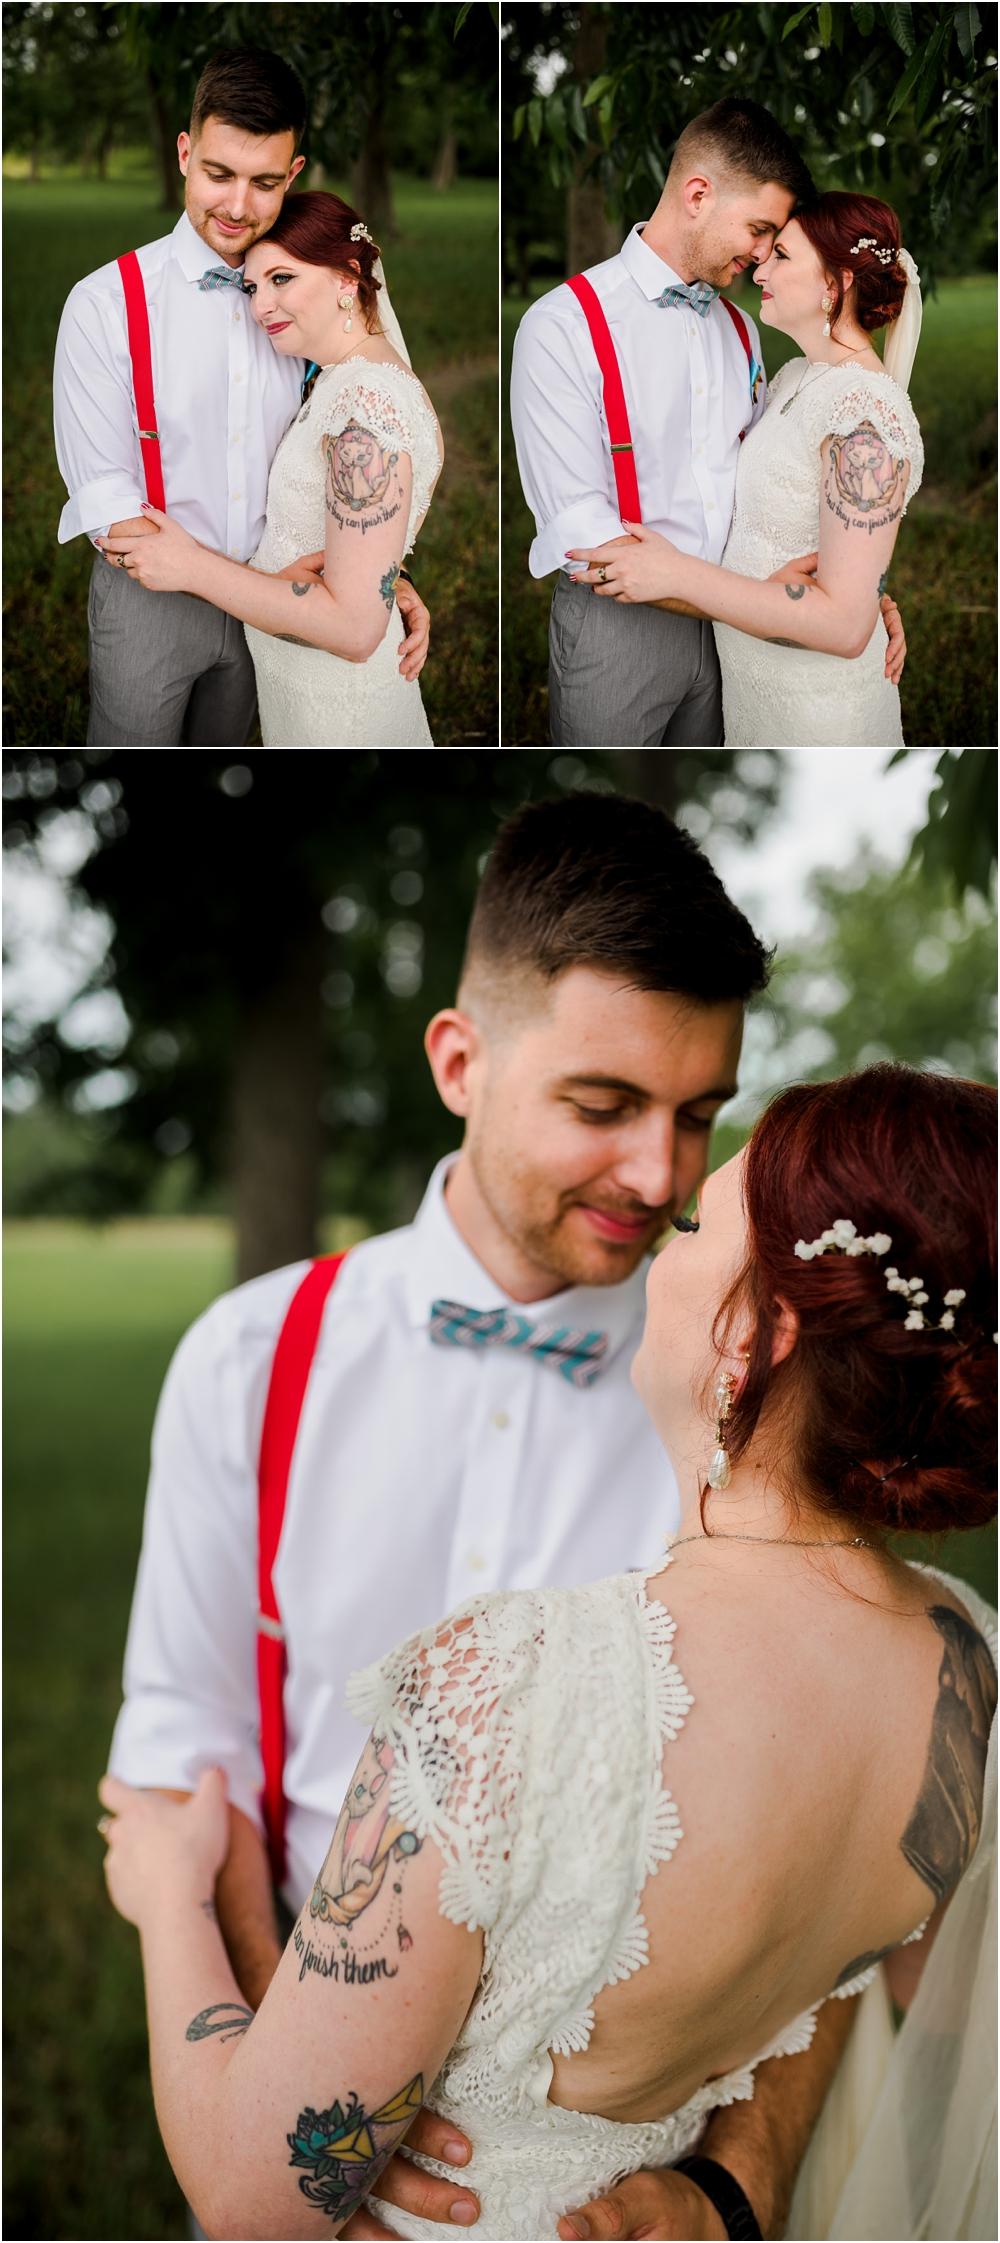 the-barn-at-wateroaks-circus-florida-wedding-photographer-kiersten-stevenson-photography-64.jpg